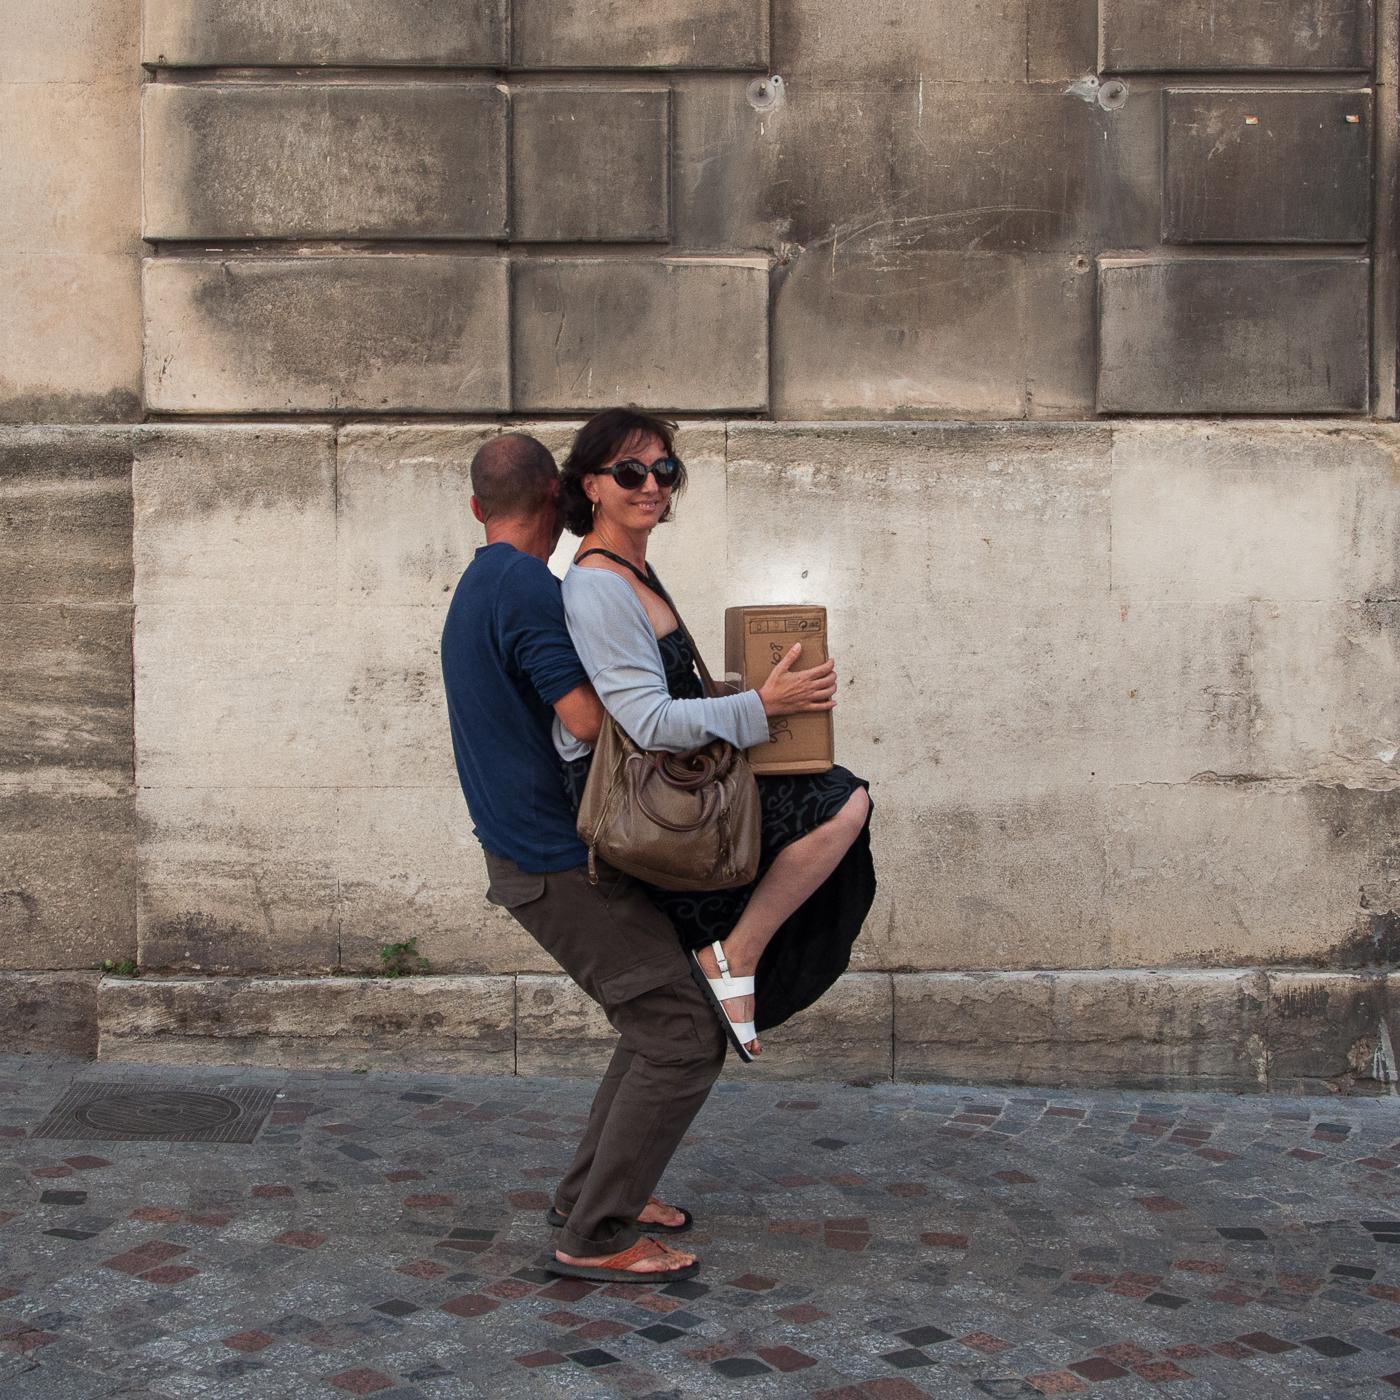 Arles 2015 - Le colis